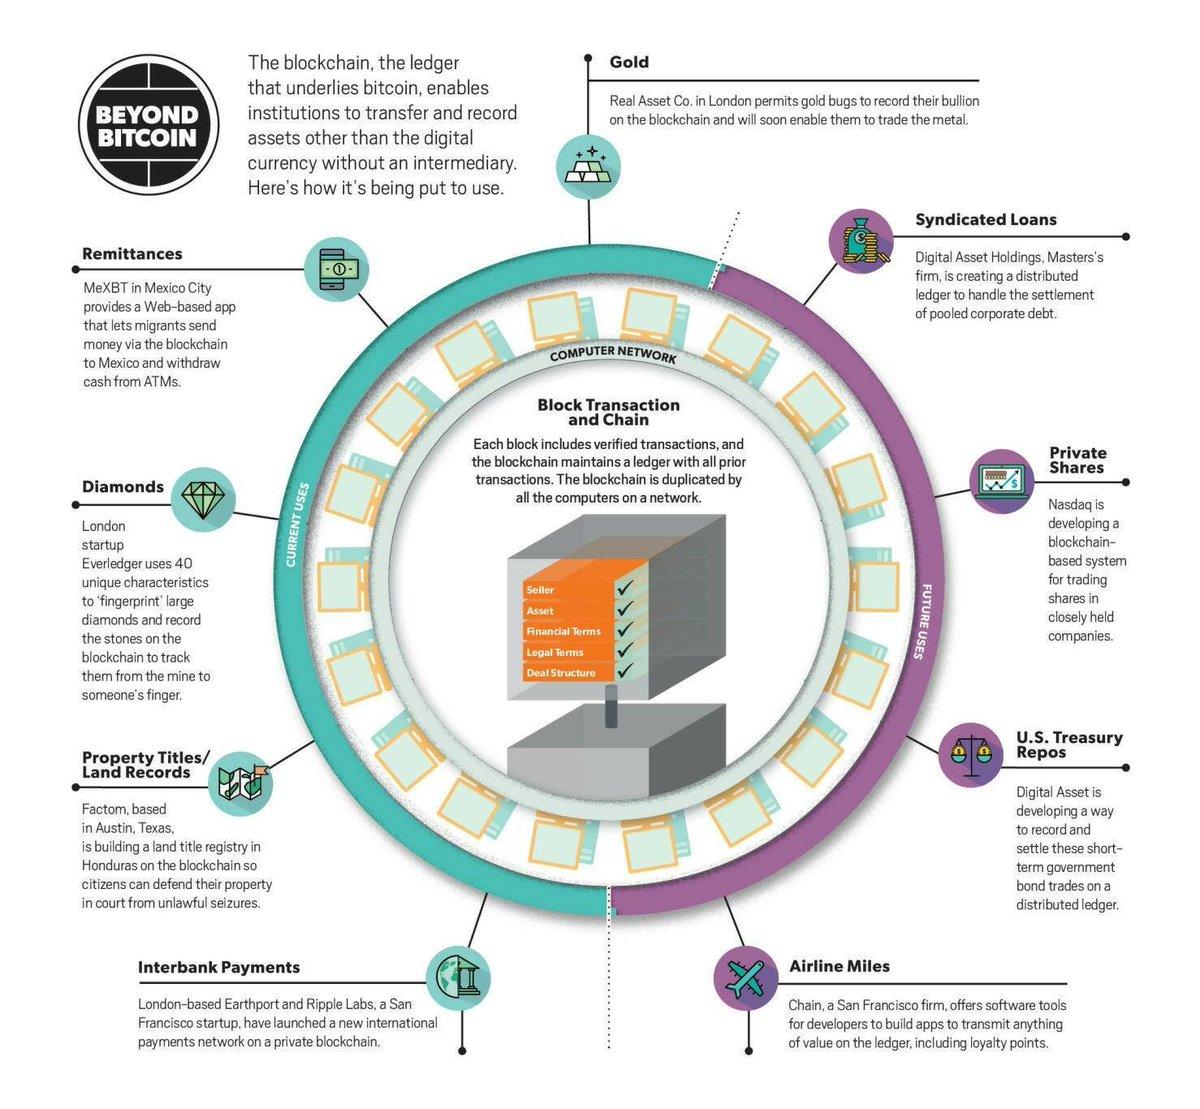 Blockchain Use-Cases Beyond Bitcoin!   #fintech #BigData #innovation #disruption #defstar5 #mpgvip #AI #ML #Blockchain #Payments #Digital #DigitalTransformation #makeyourownlane @miguelselas @PetiotEric<br>http://pic.twitter.com/2Zi1w9StUL